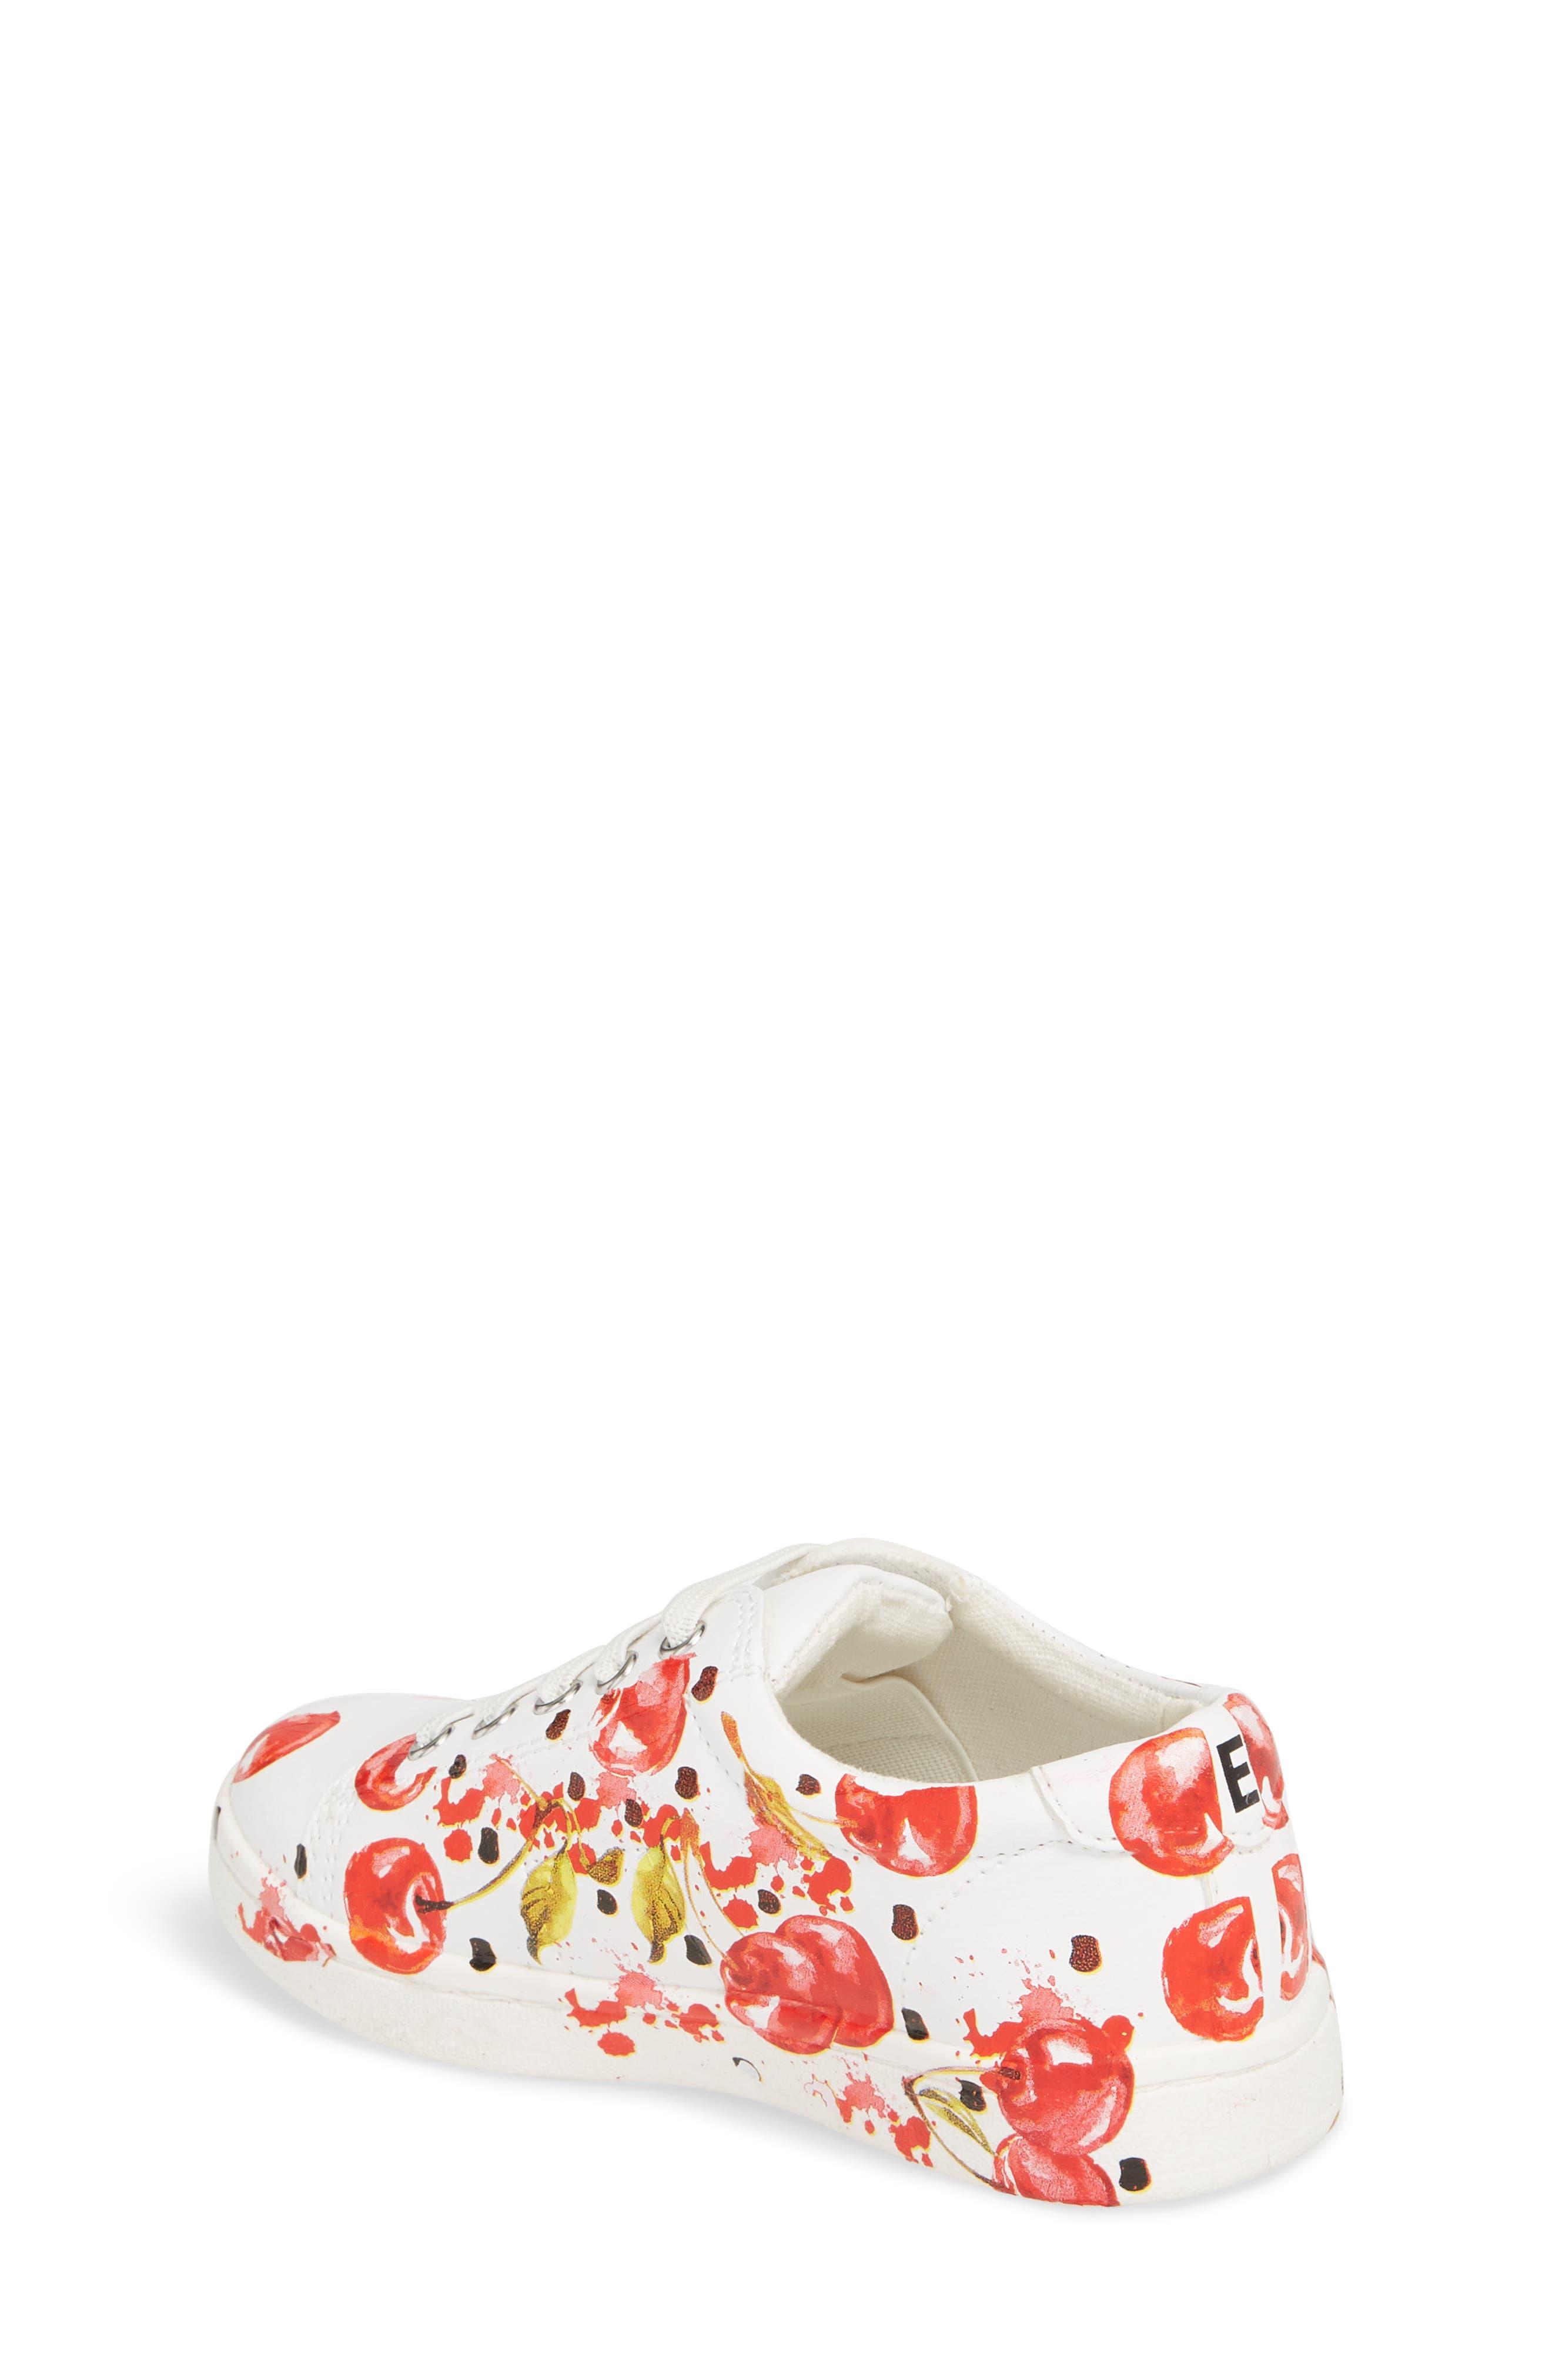 Blane Milford Fruit Print Sneaker,                             Alternate thumbnail 2, color,                             White/ Cherry Faux Leather